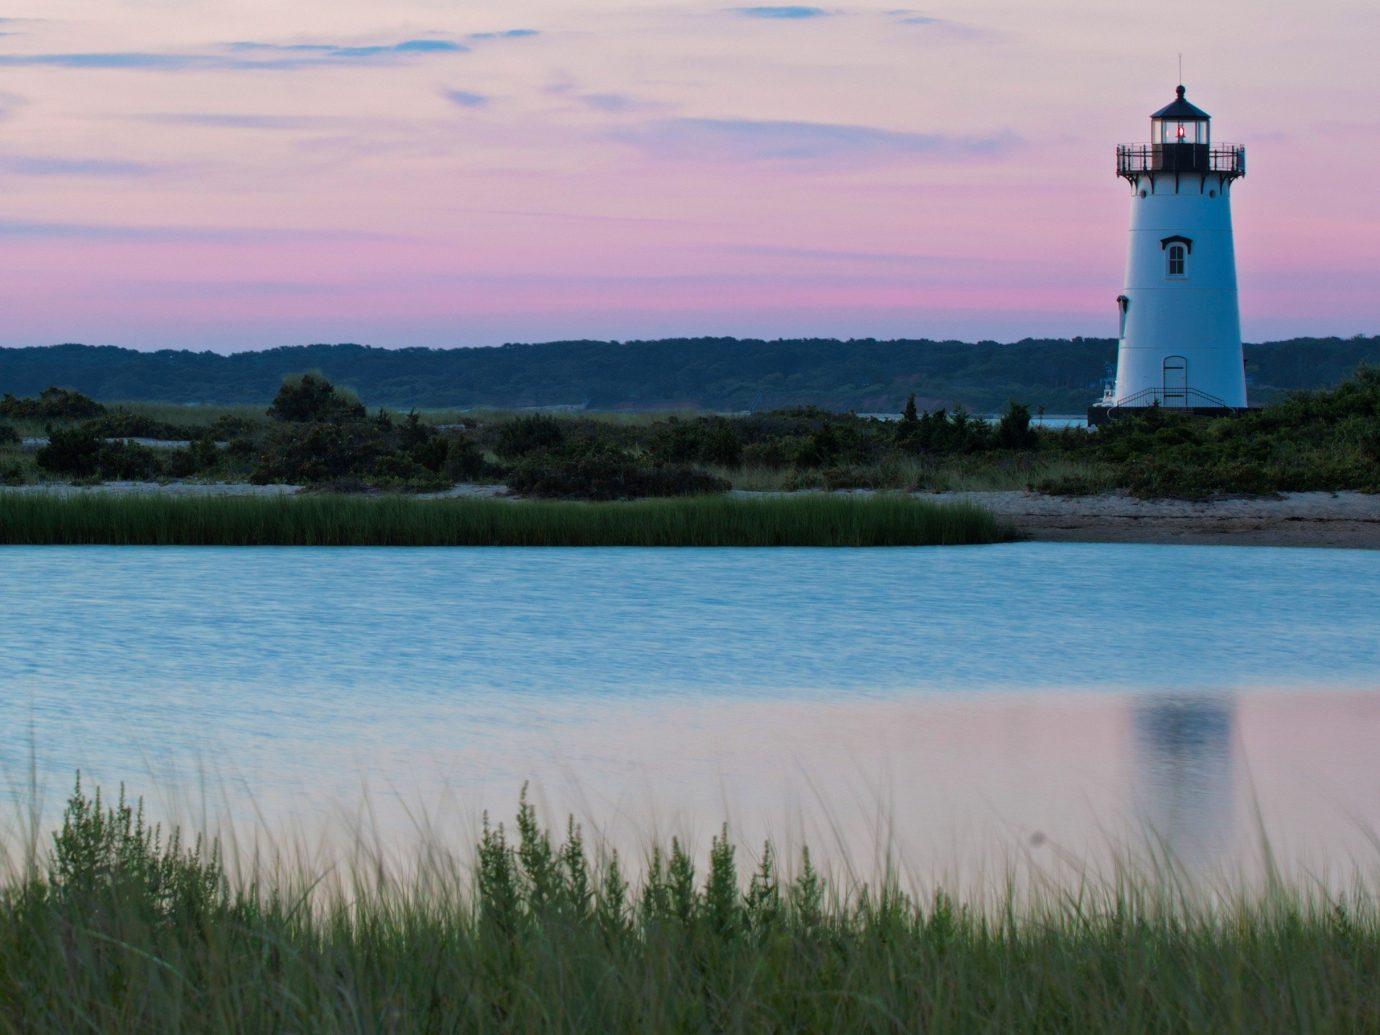 Beach outdoor water sky grass tower lighthouse Lake shore Sea horizon reflection Coast loch dawn bay marsh dusk Sunset distance